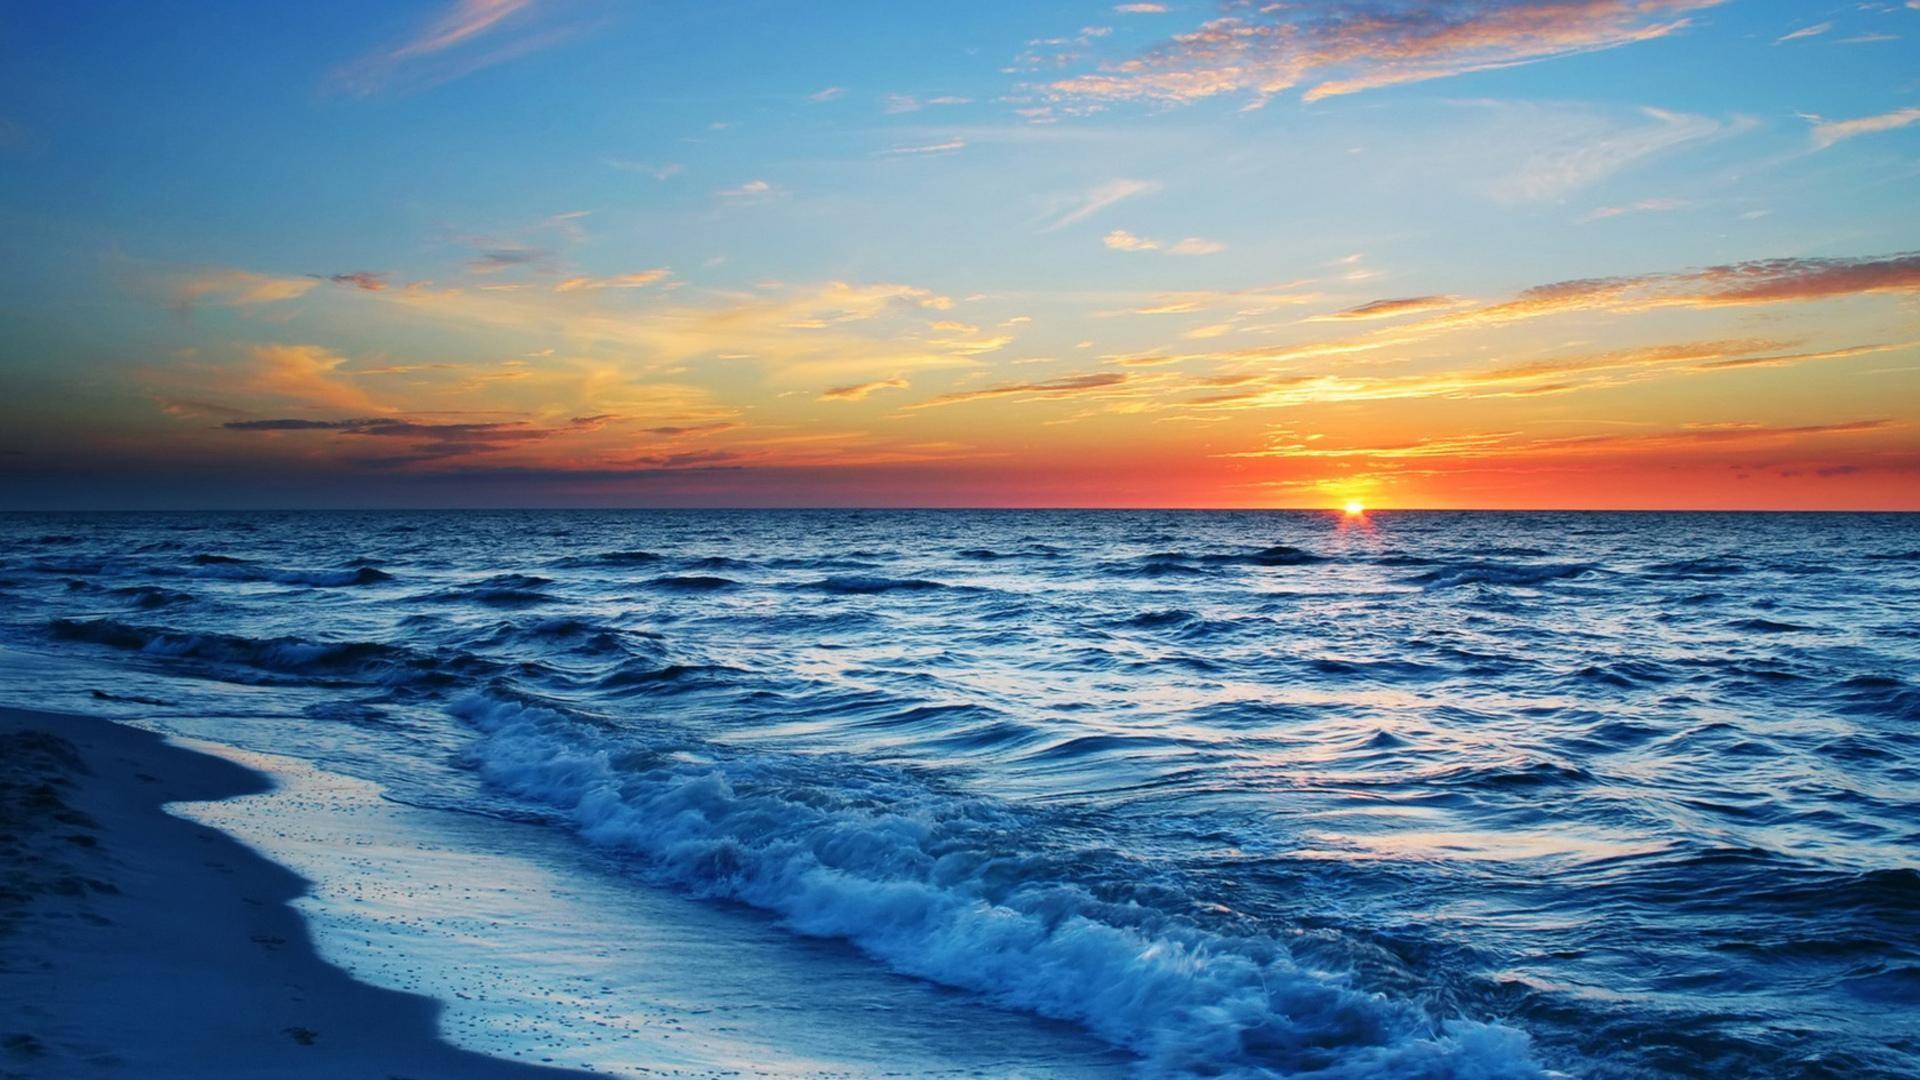 Ocean Sunset Wallpapers – Wallpaper Cave